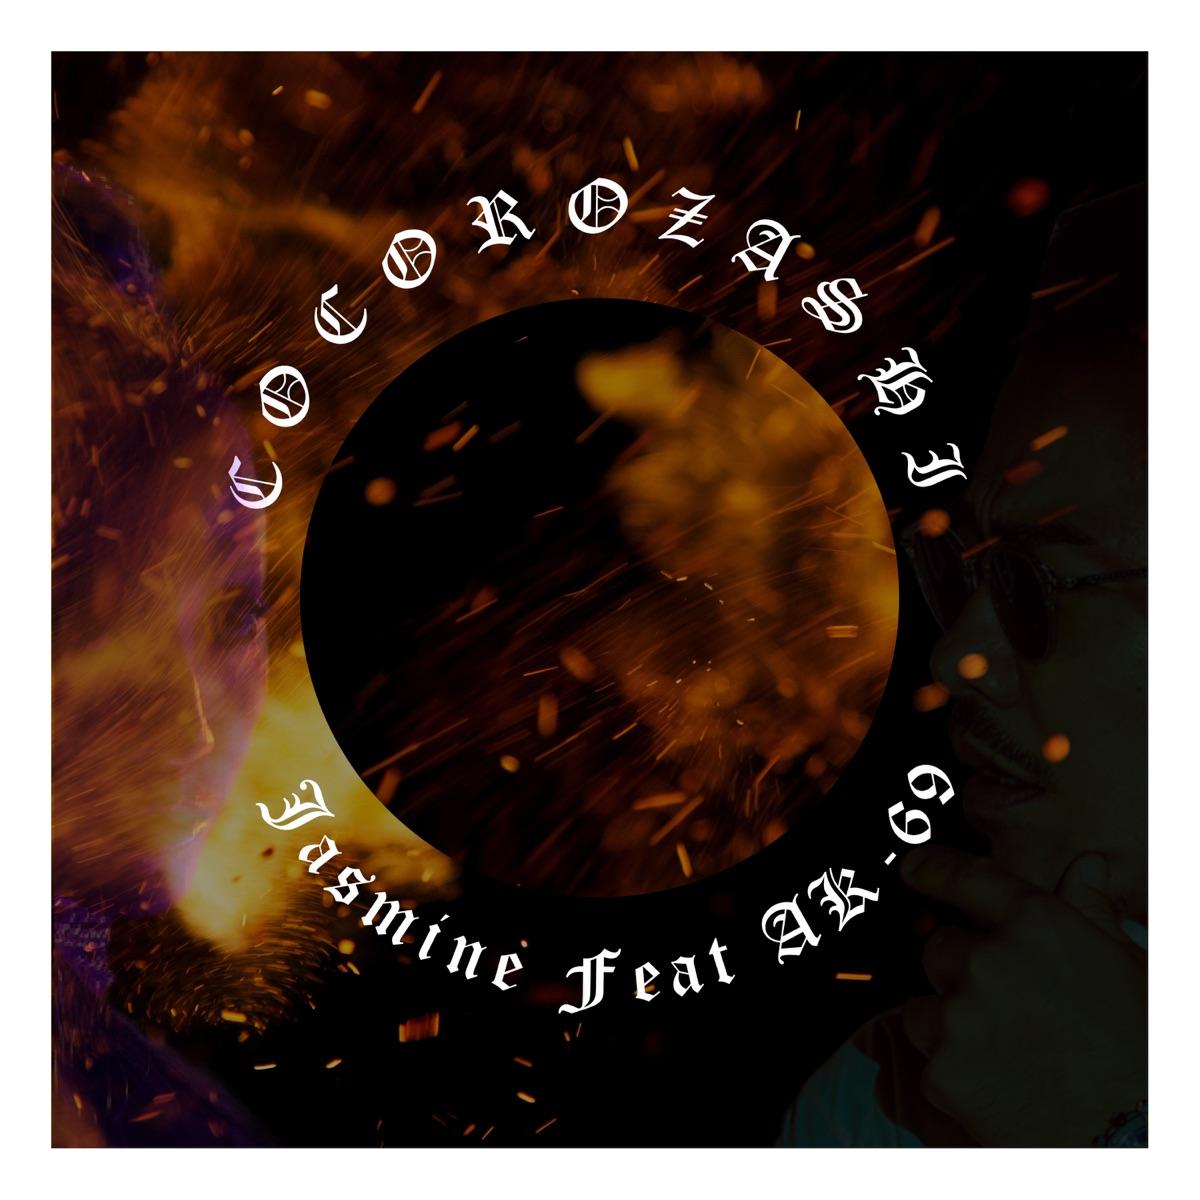 『JASMINECOCOROZASHI feat. AK-69』収録の『COCOROZASHI feat. AK-69』ジャケット